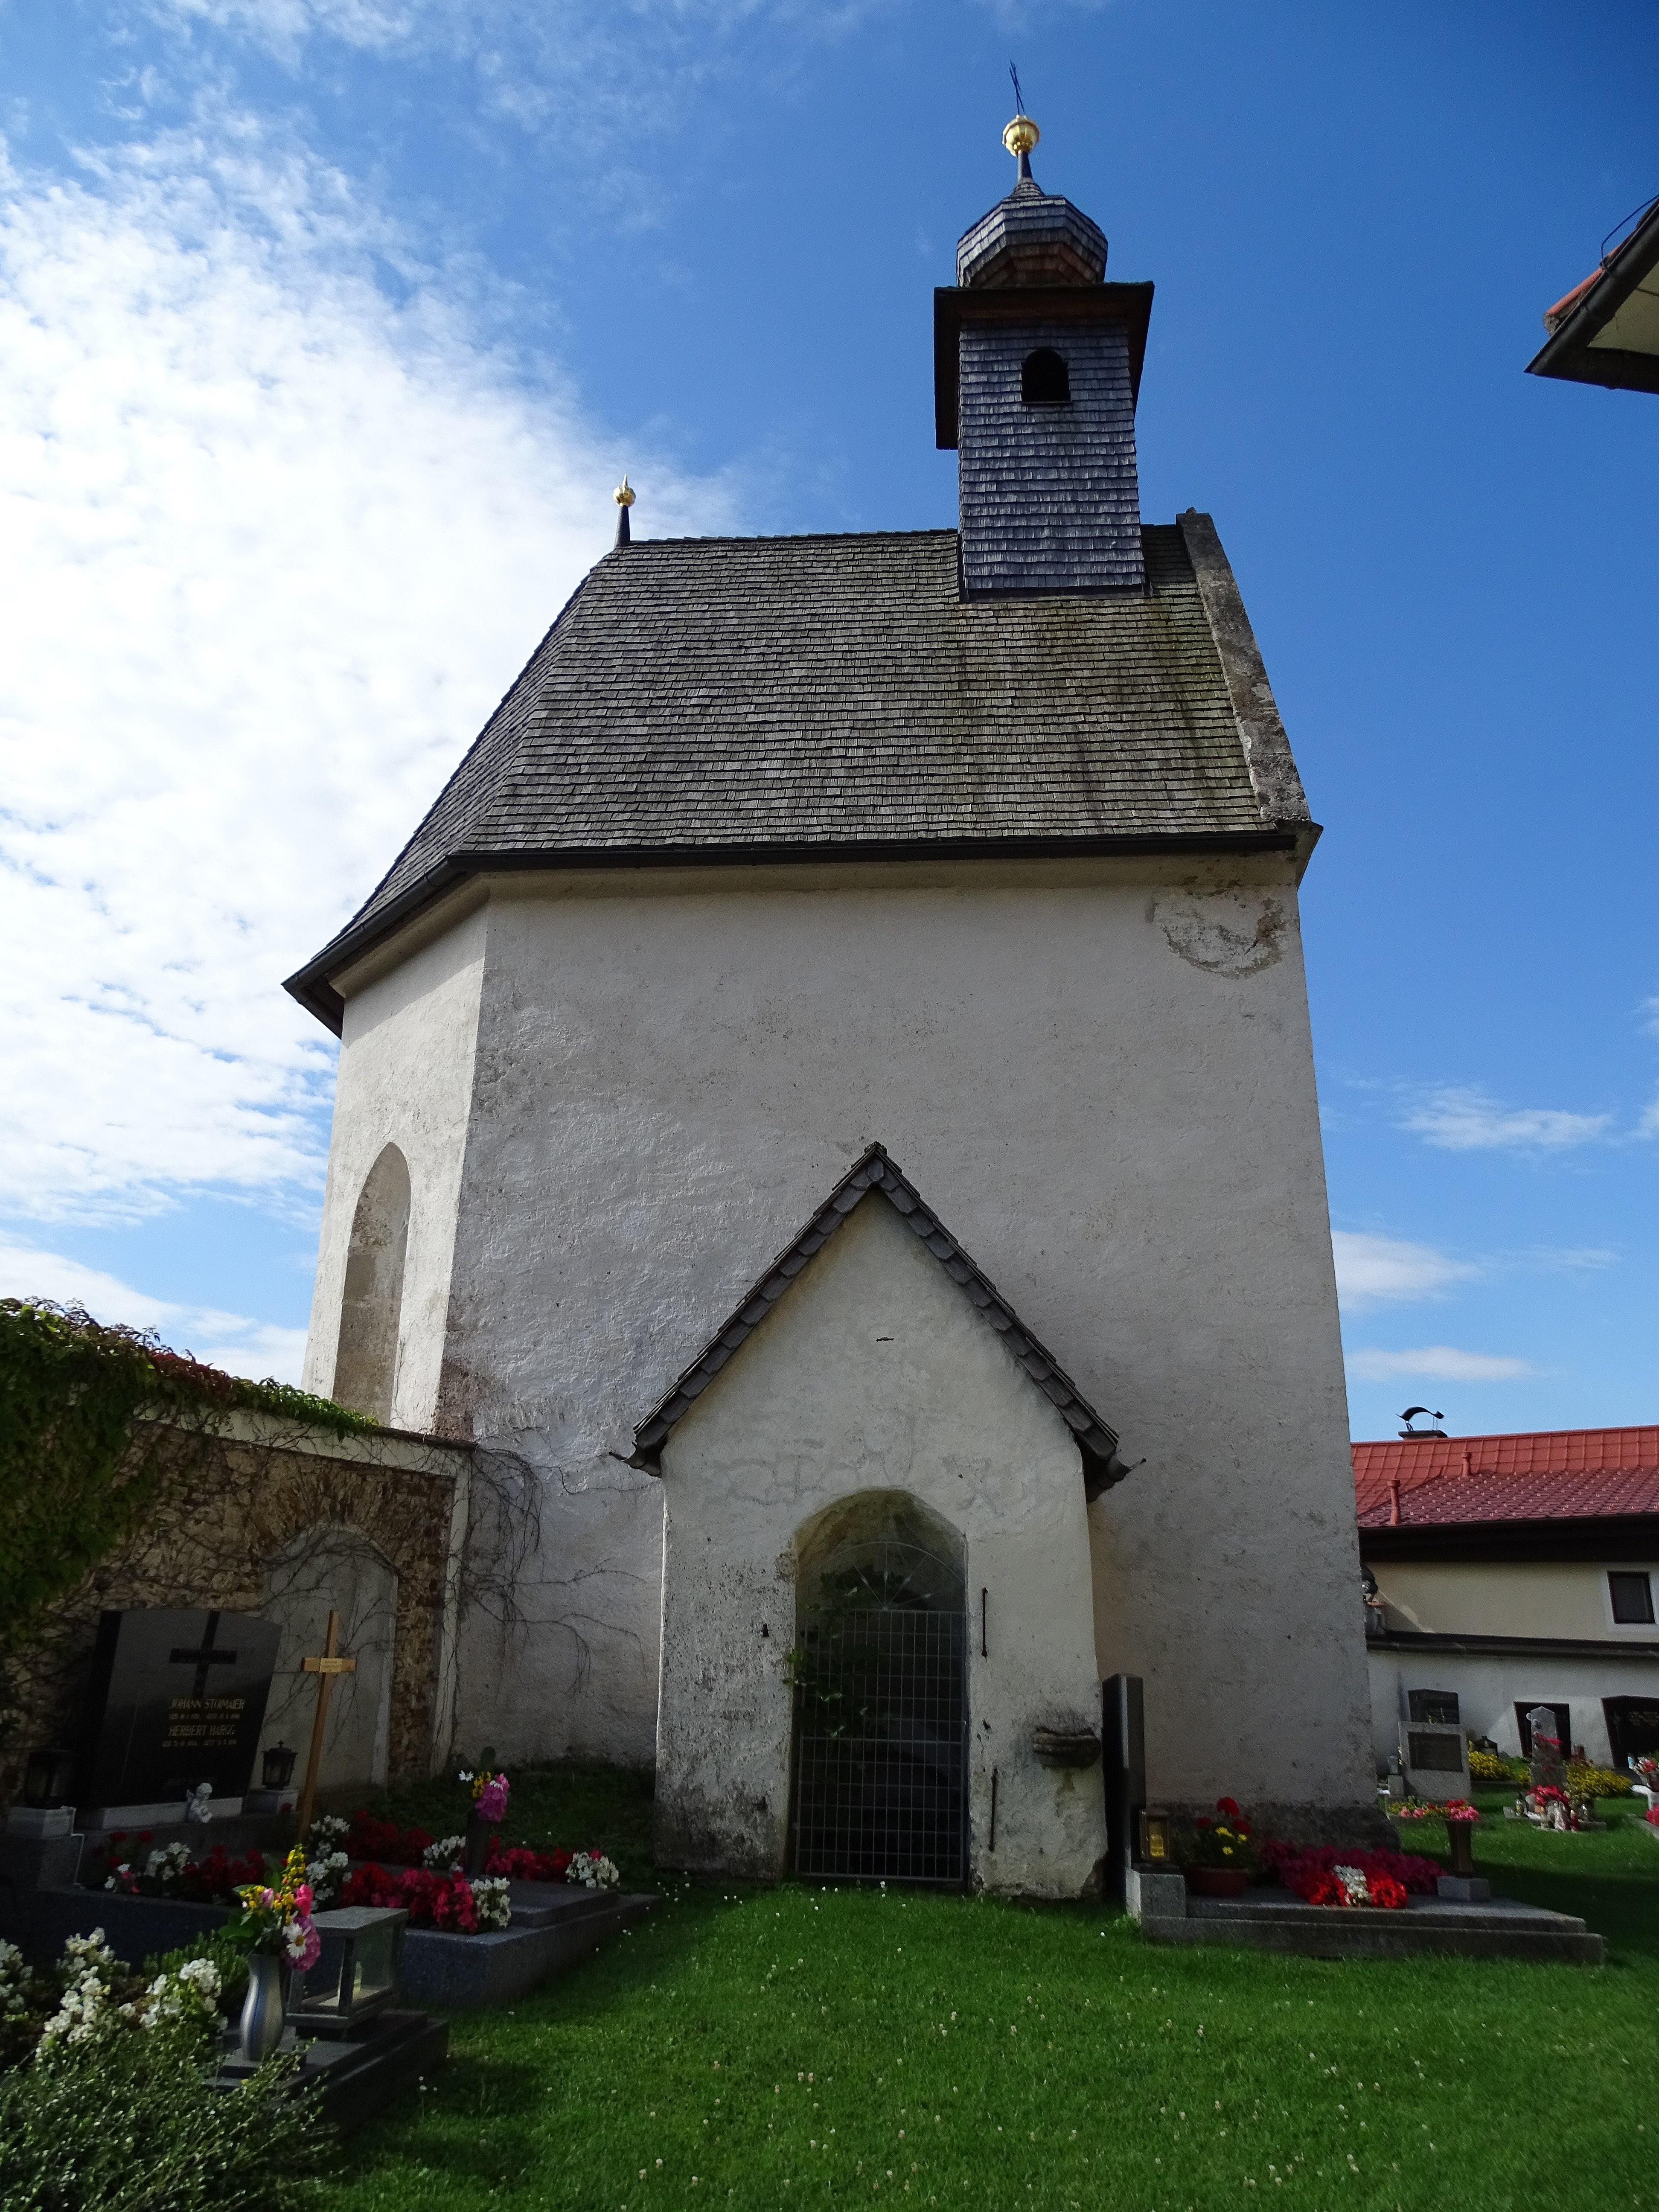 Fileannakapelle St Pankrazenjpg Wikimedia Commons